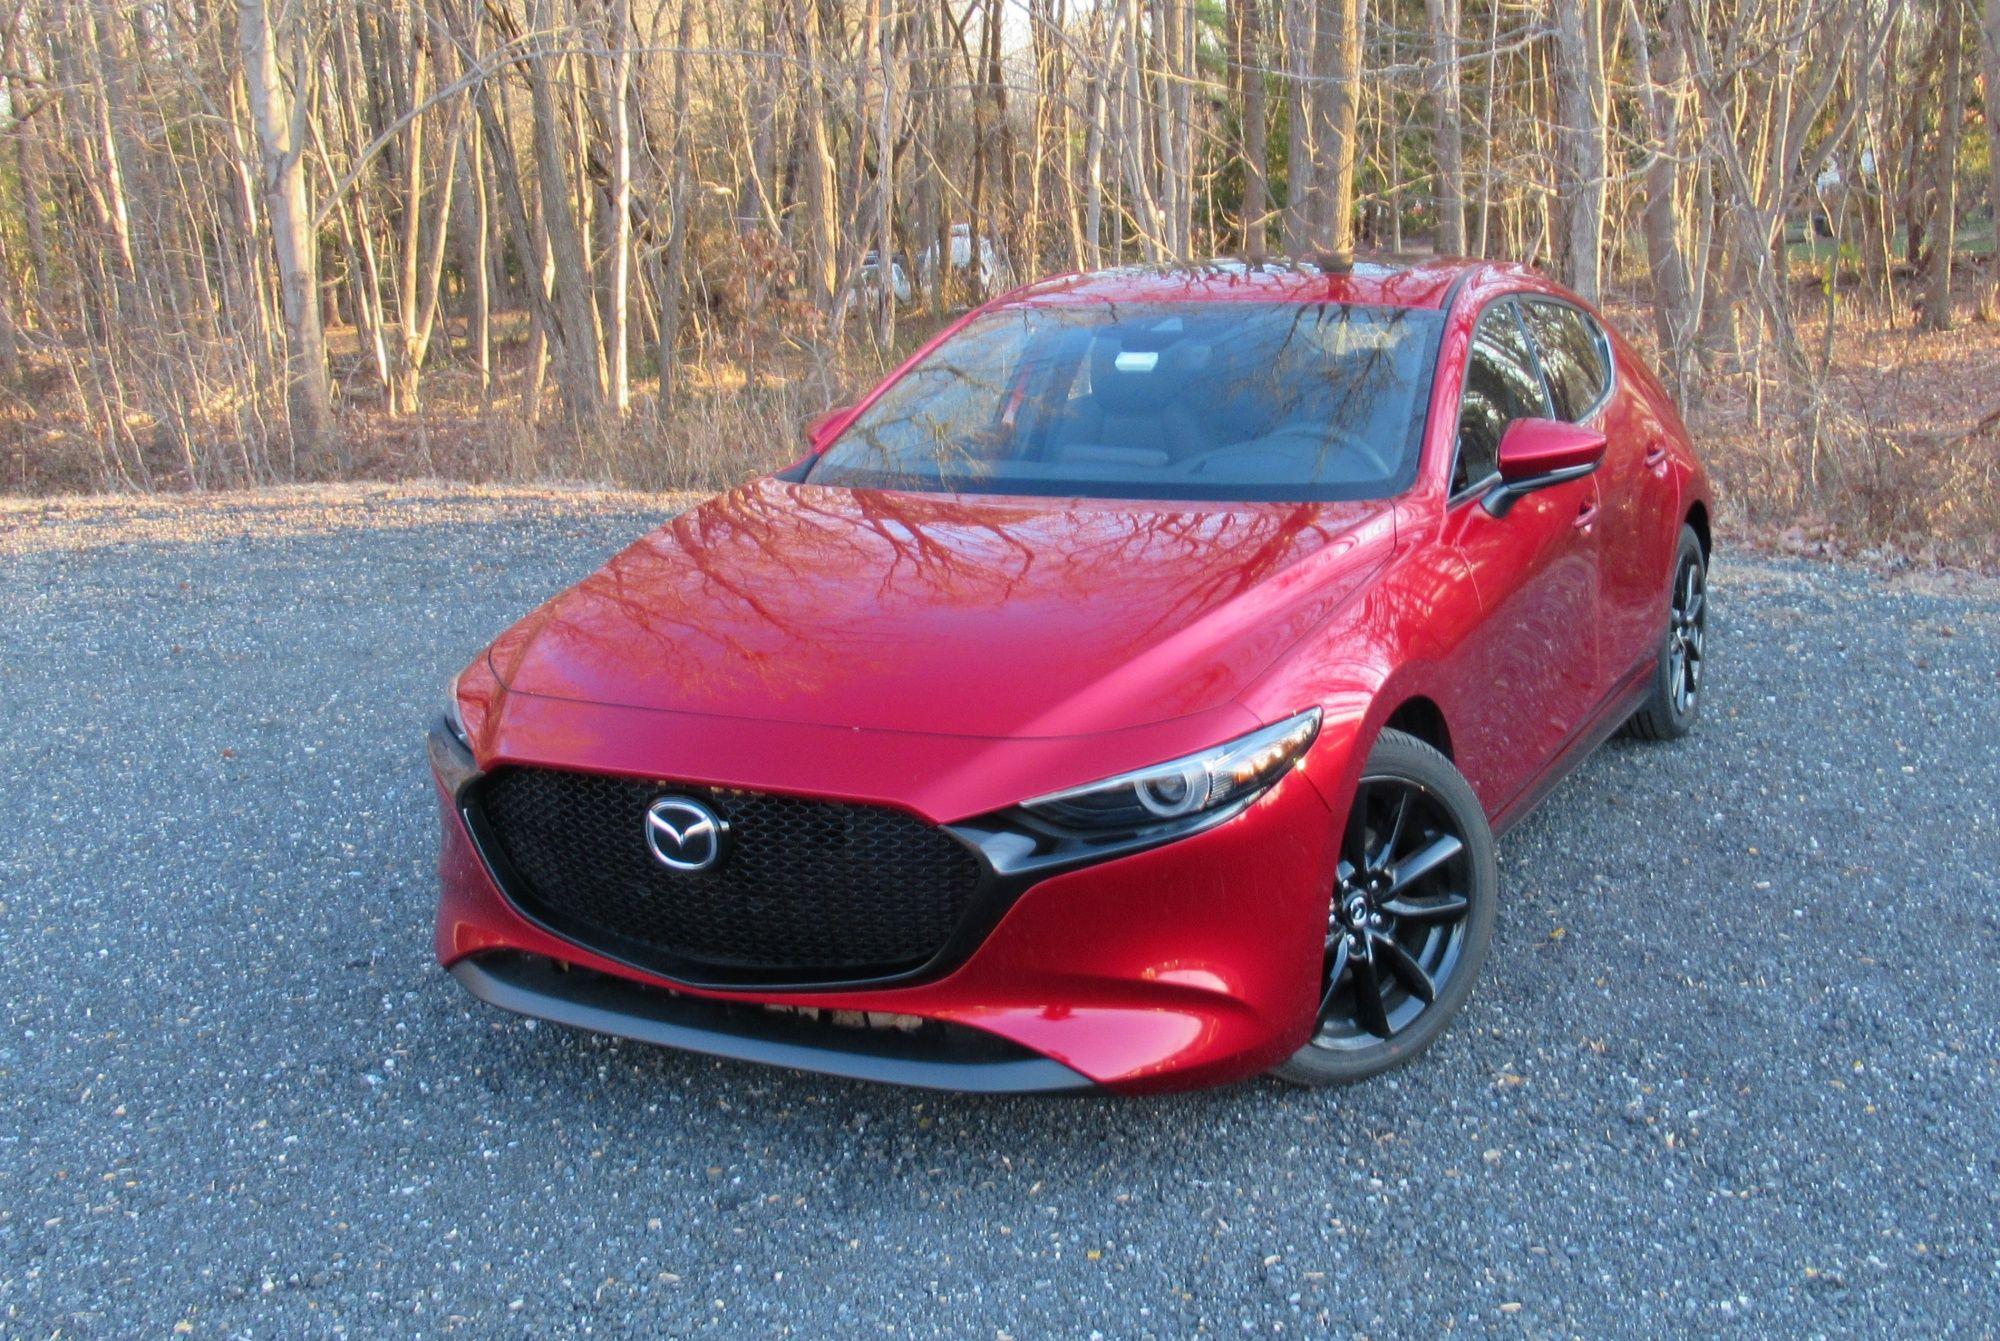 2020 Mazda 3 Driven Review Top Speed Mazda Toyota Corolla Mazda 3